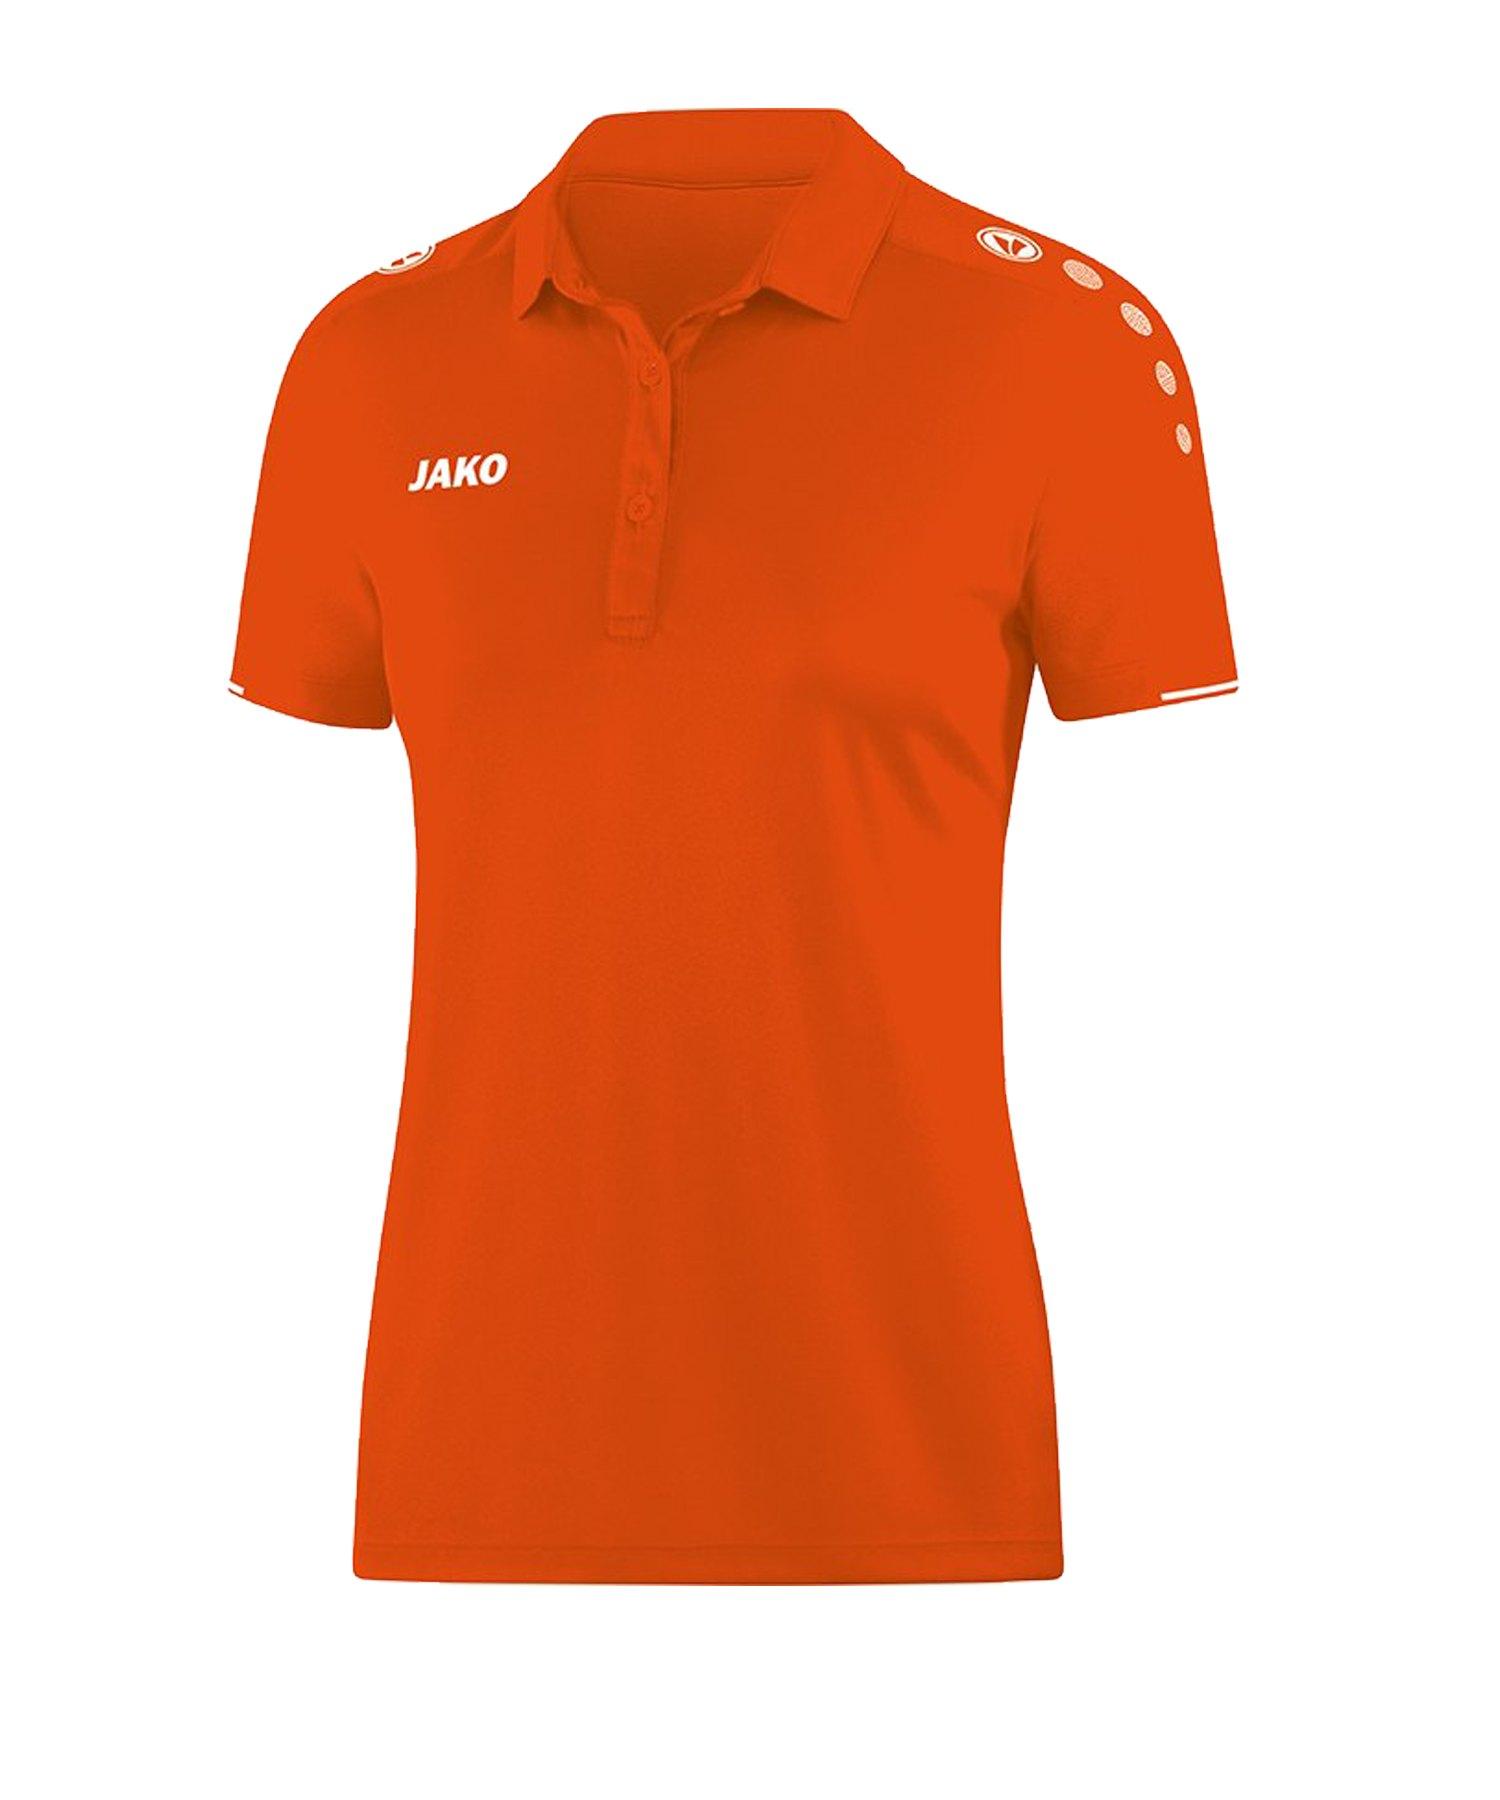 Jako Classico Poloshirt Damen Orange F19 - Orange